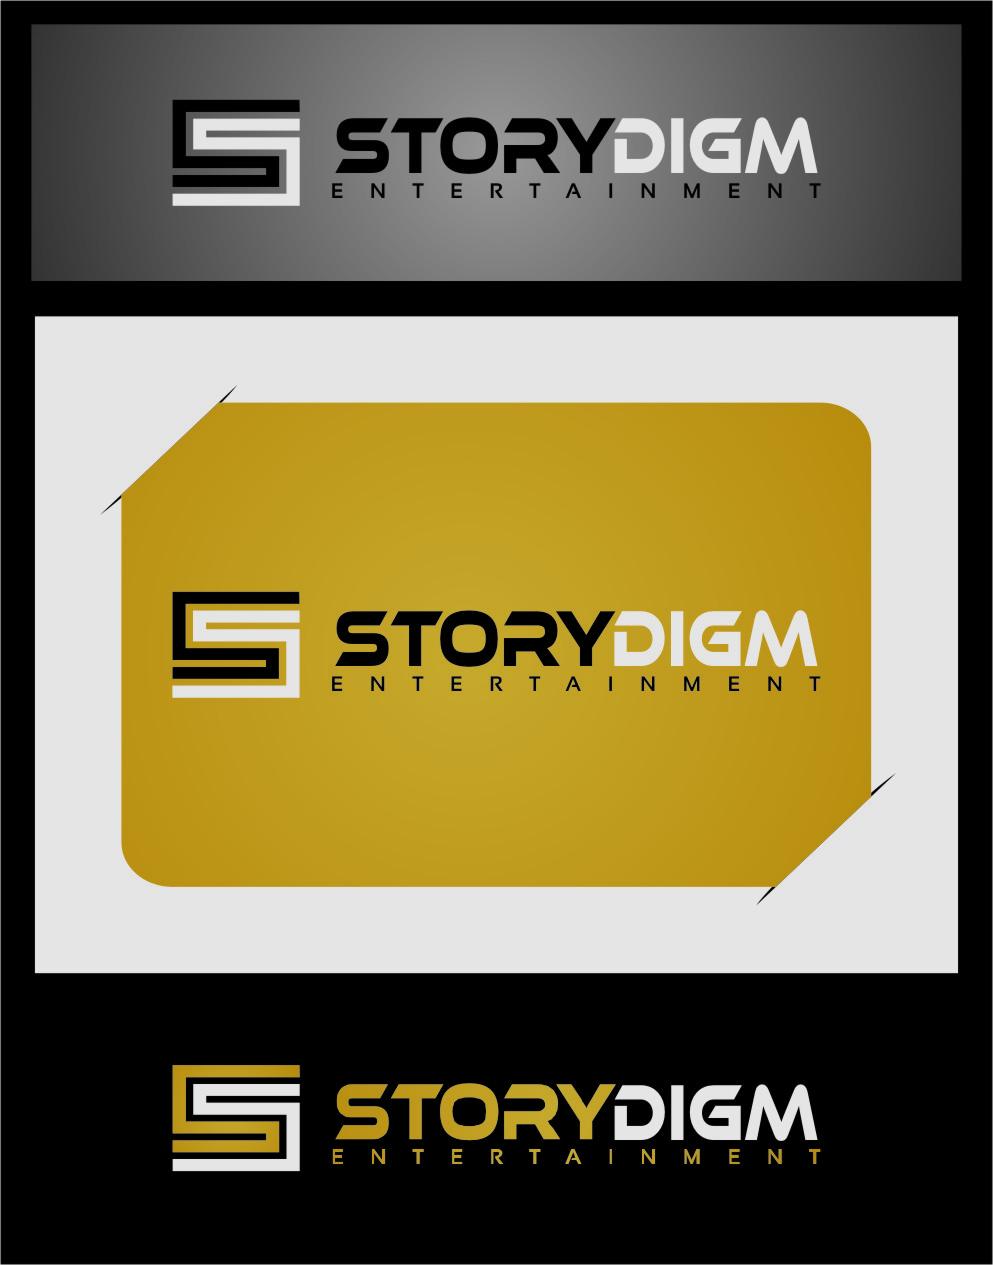 Logo Design by Ngepet_art - Entry No. 76 in the Logo Design Contest Inspiring Logo Design for Storydigm Entertainment.